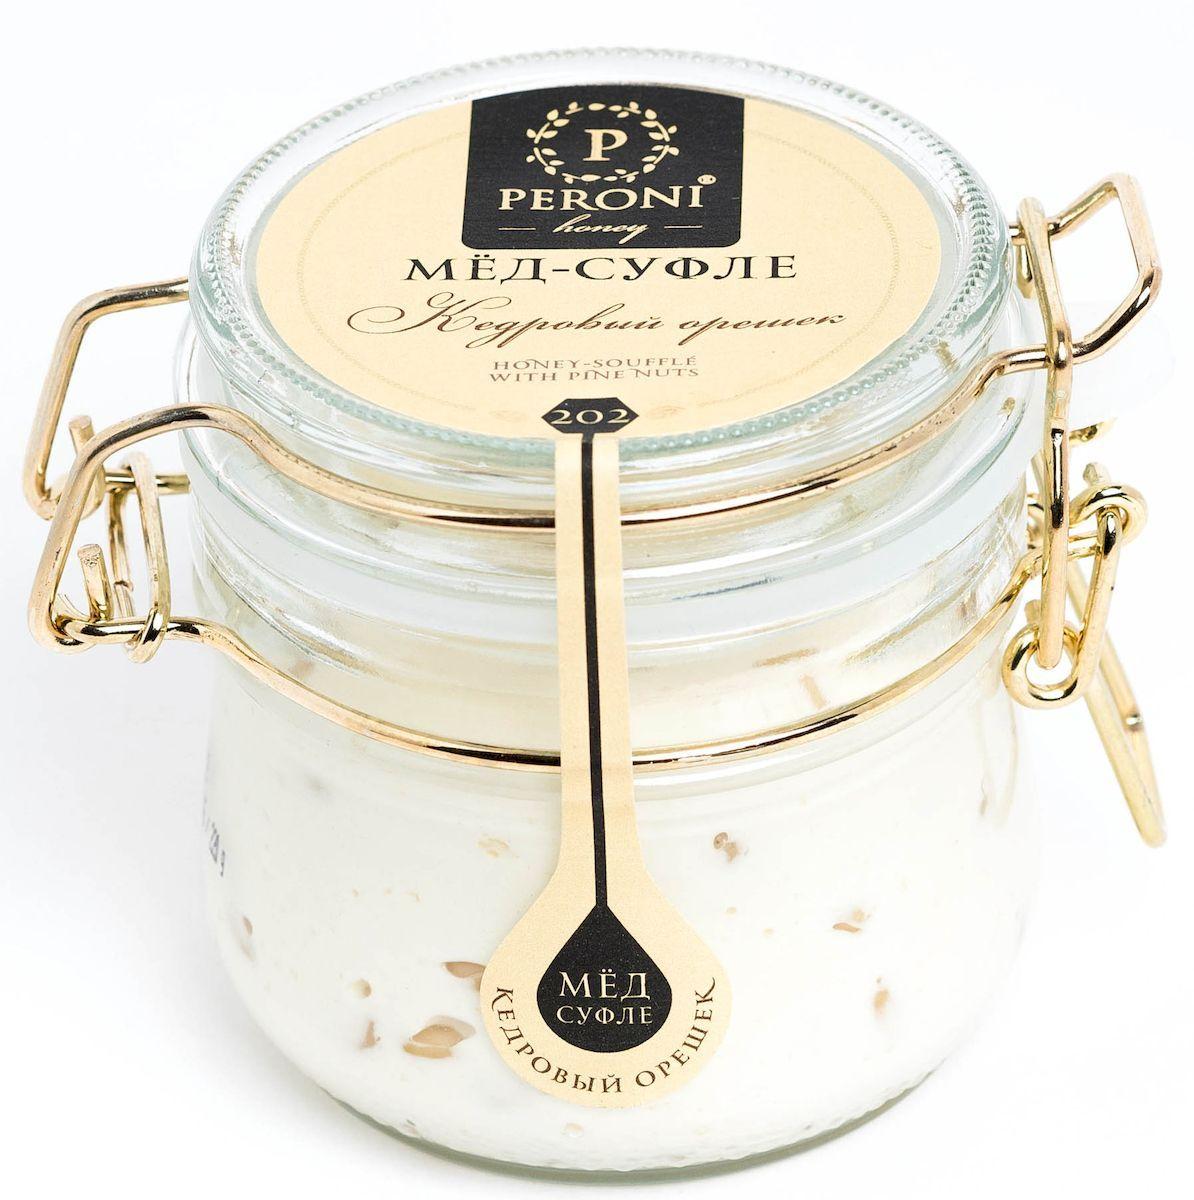 Peroni Кедровый орешек мёд-суфле, 220 г медовая серия peroni энерджи premium 4 x 30 мл